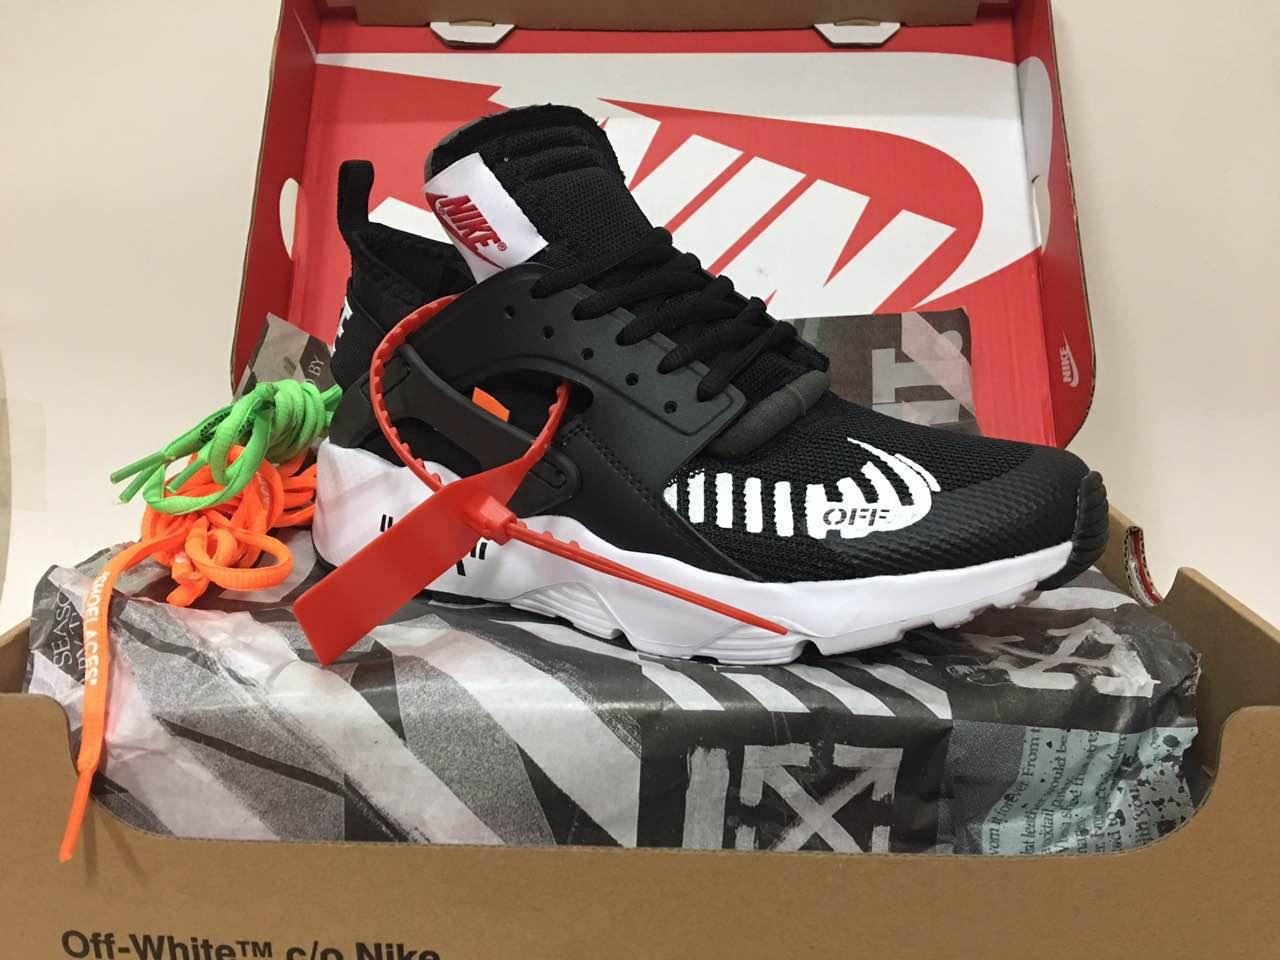 low priced d1056 c21b4 Off-white Nike Air Huarache 4 Black White Shoes